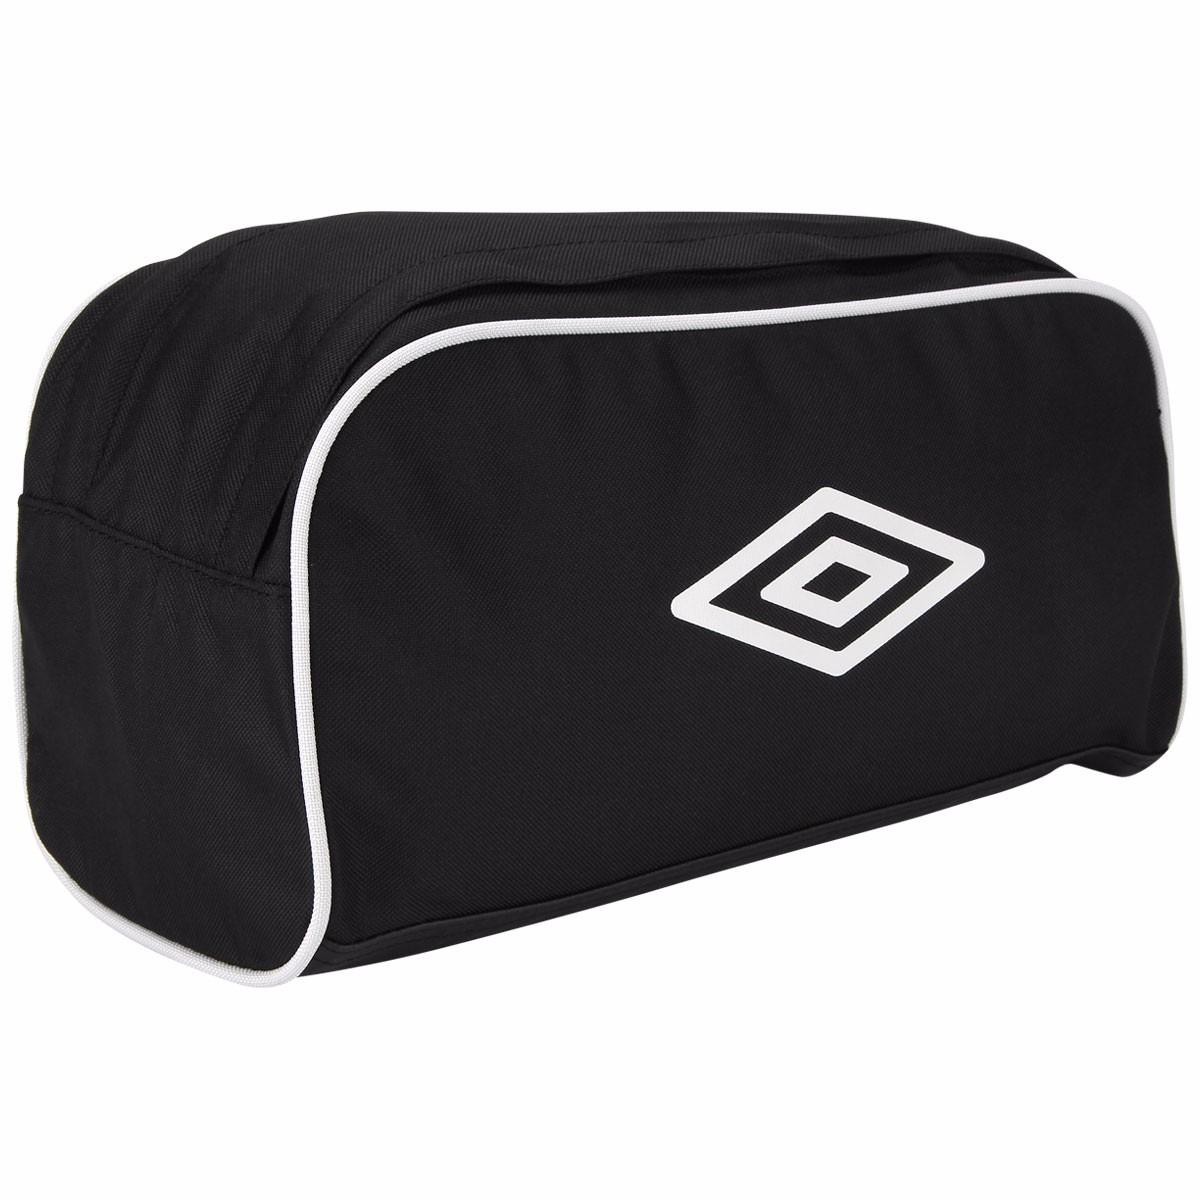 c0573cc6a3afb bolsa porta chuteira umbro original futebol society futsal. Carregando zoom.